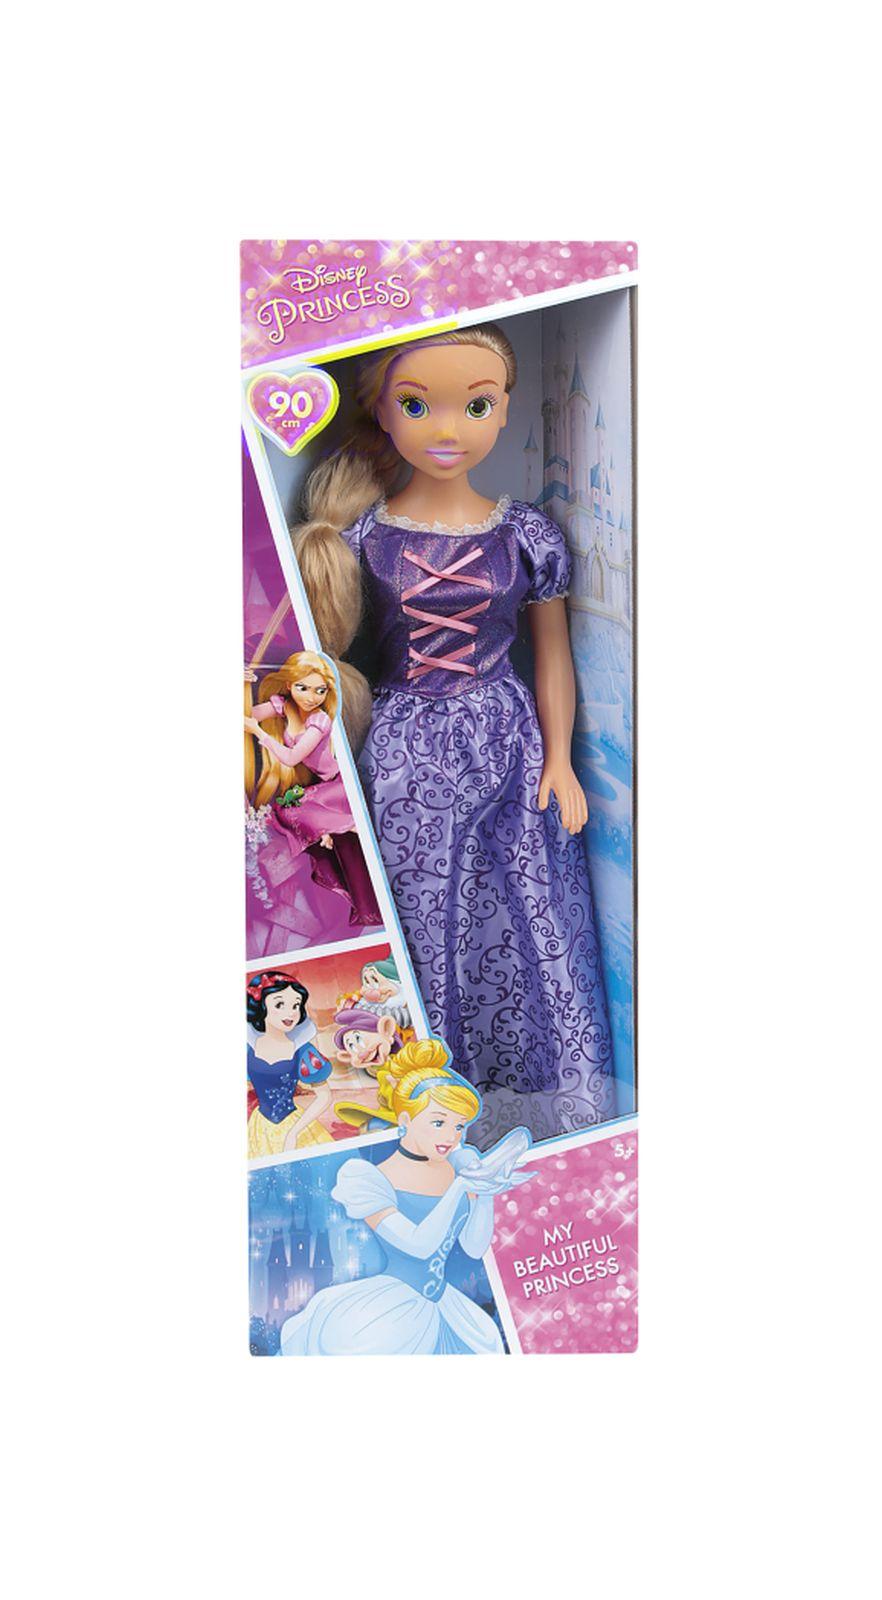 Bambola rapunzel 90cm - disney princess - PRINCIPESSE WALT DISNEY, RAPUNZEL